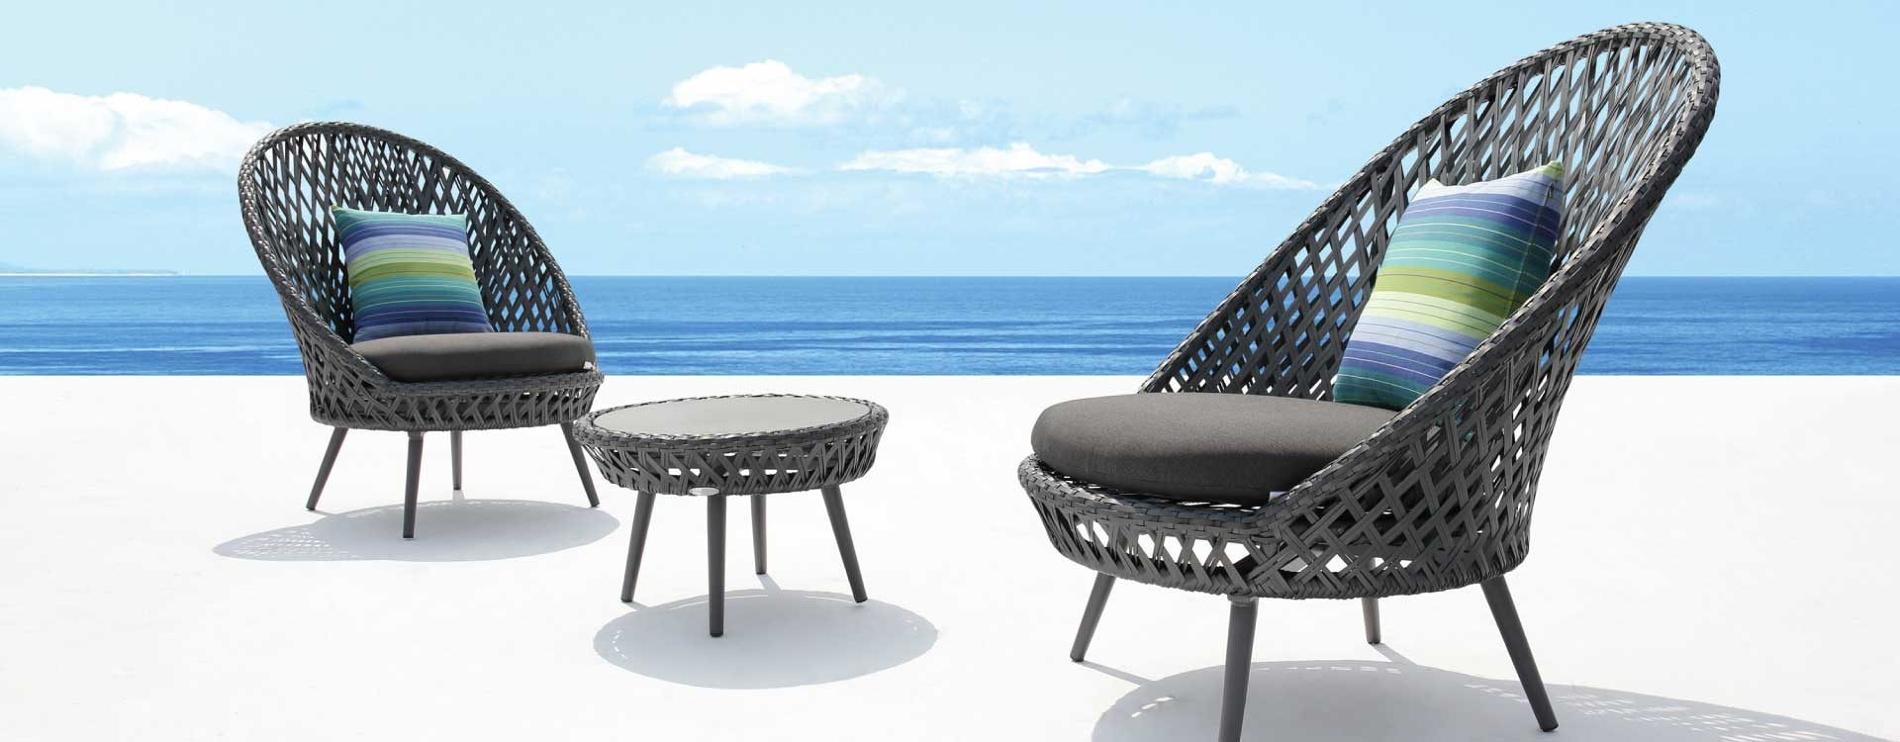 Siena Outdoor Chairs Slate Grey